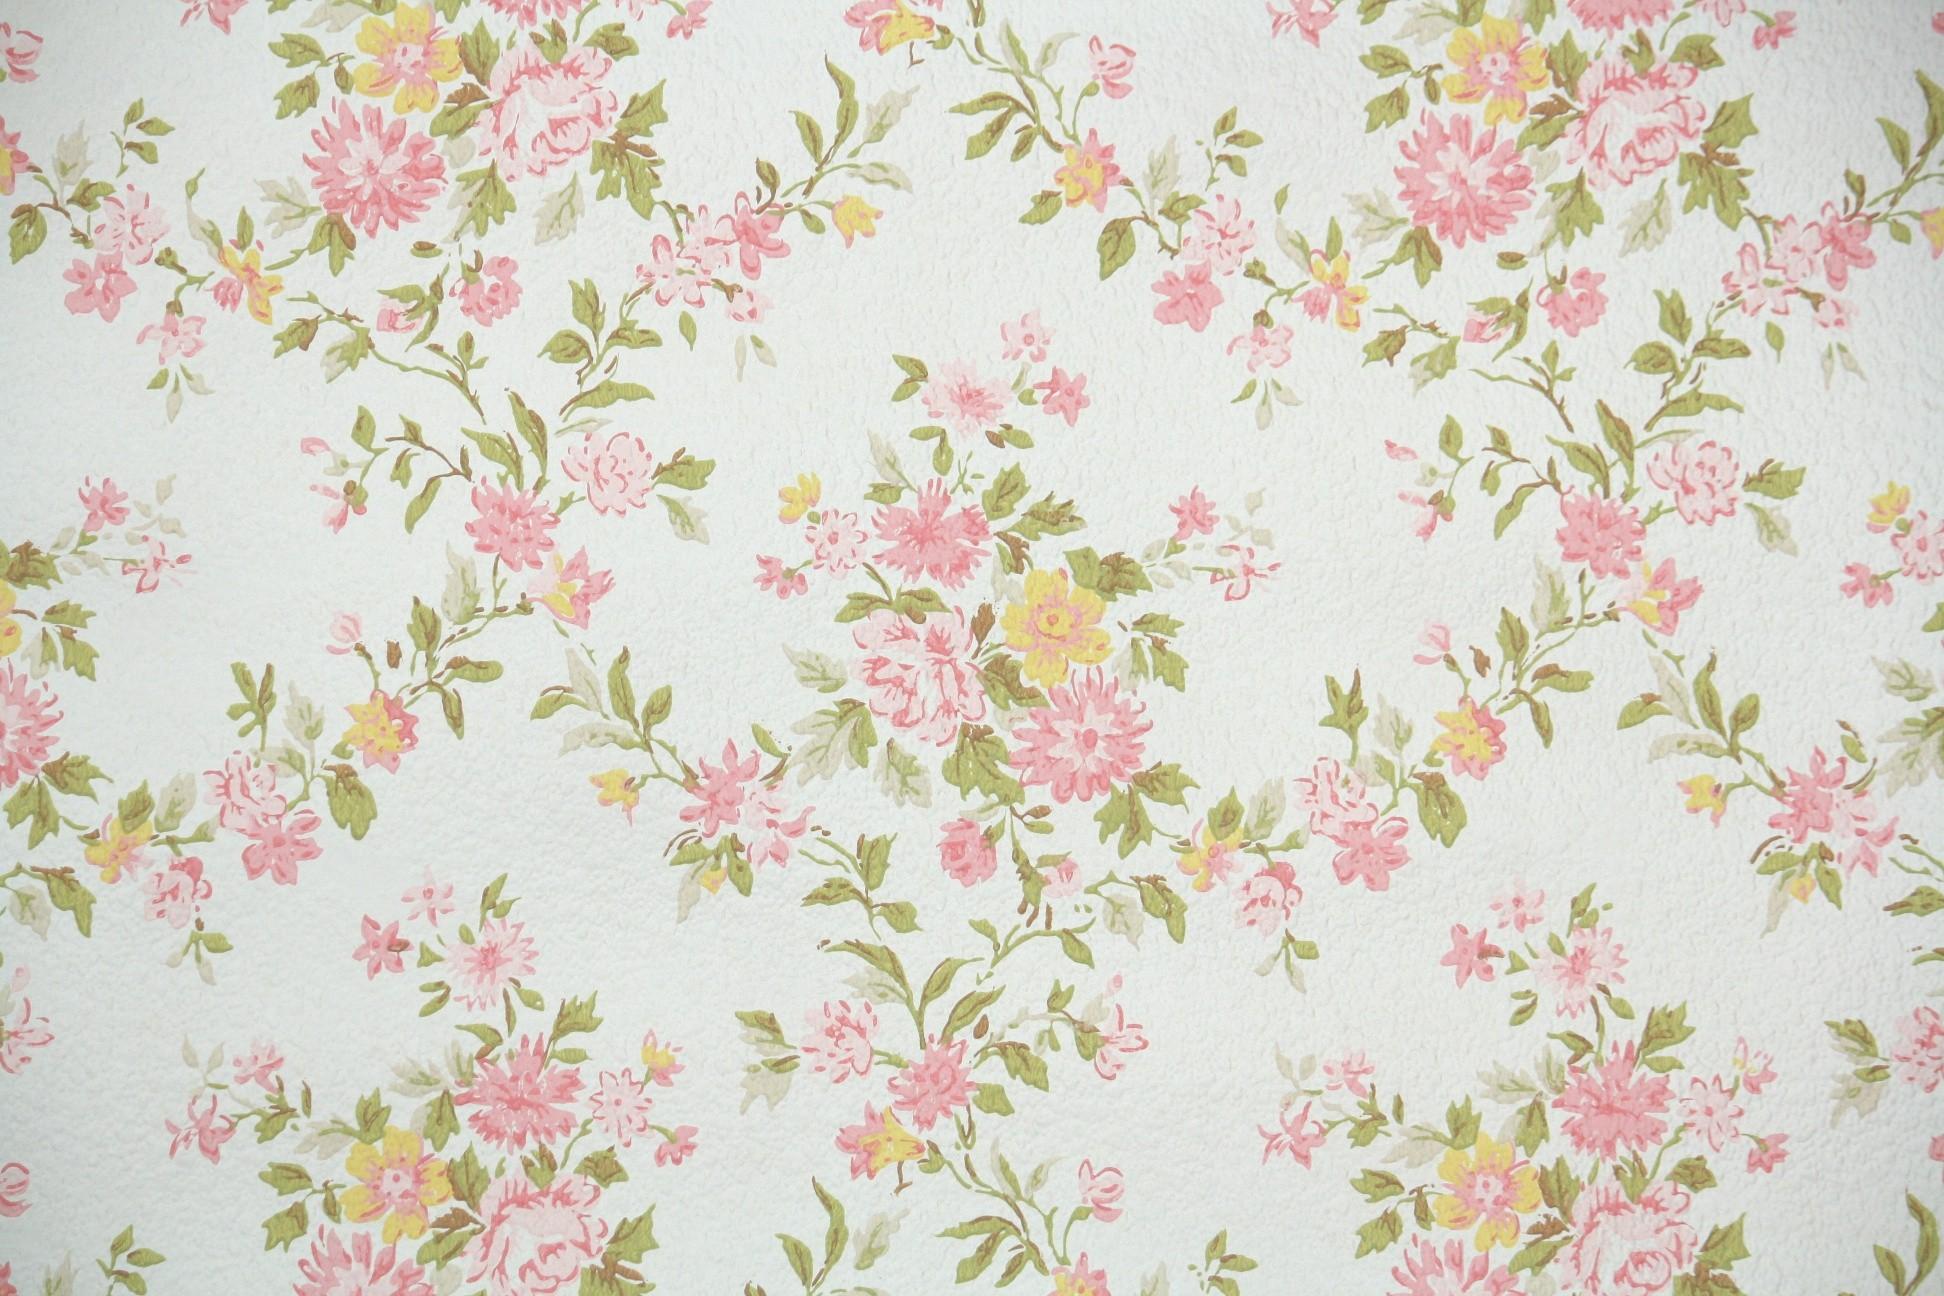 Vintage Floral Wallpaper Download Free Cool High Resolution